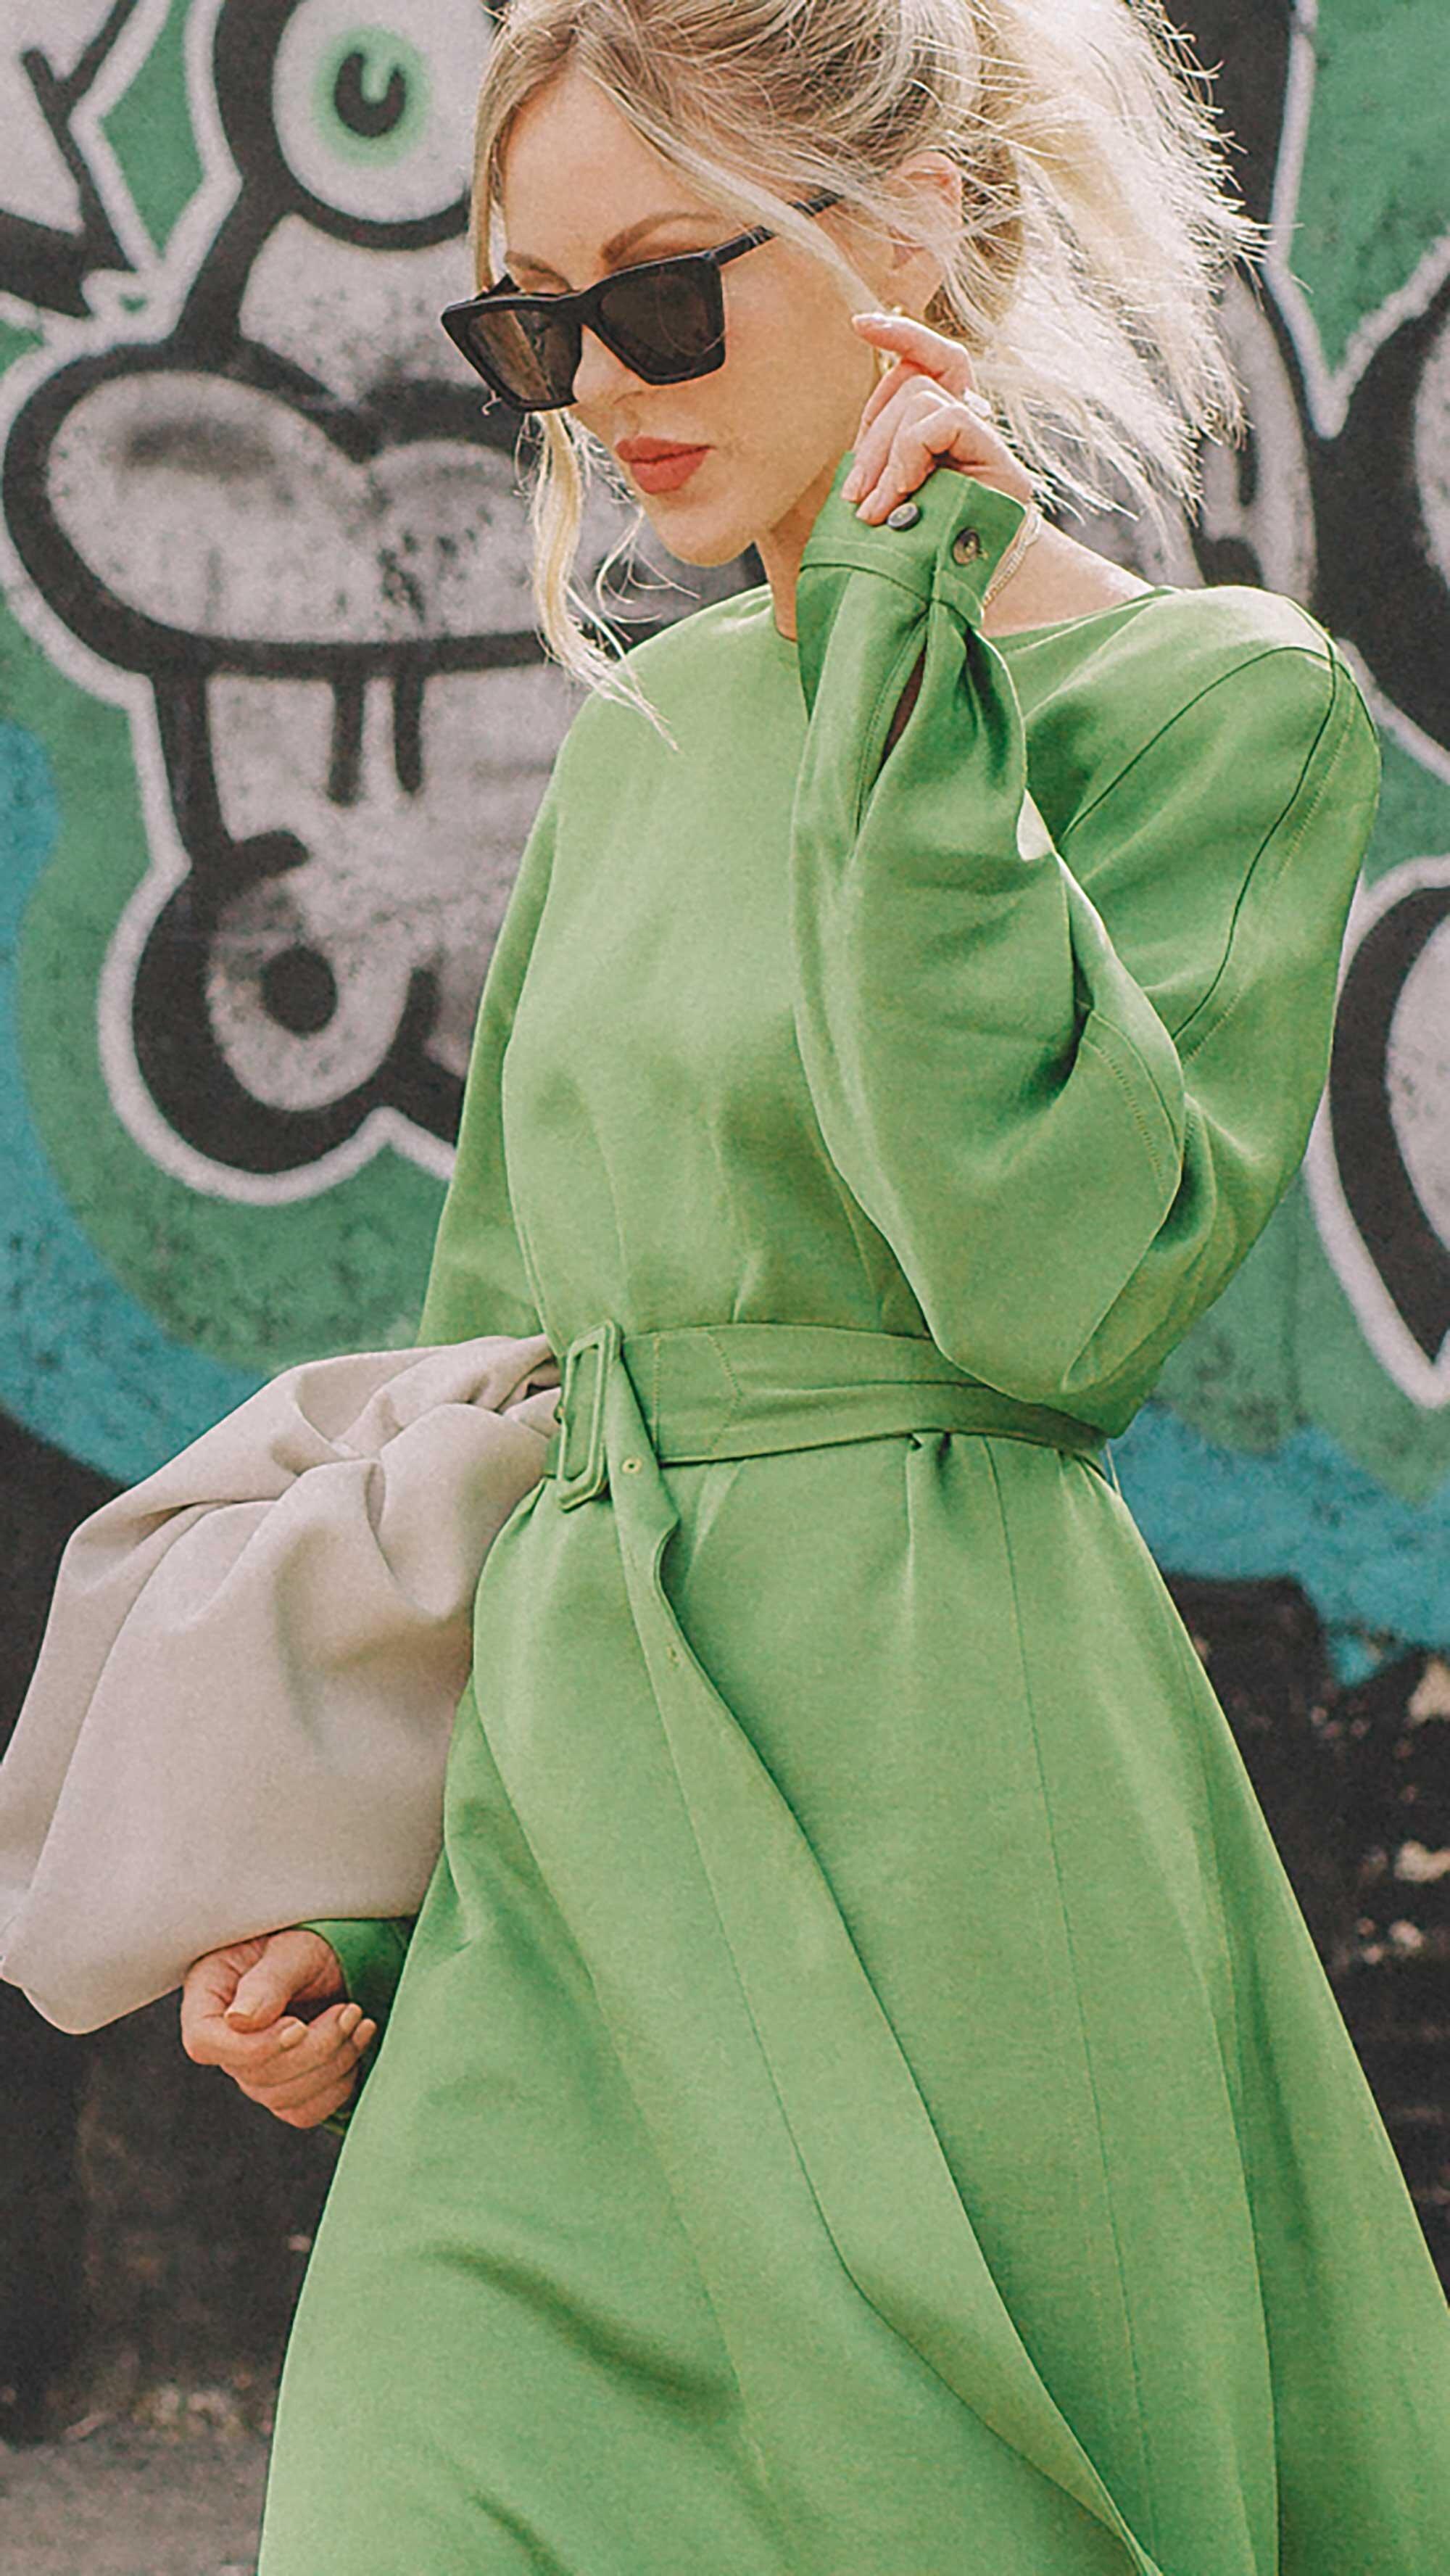 Click for more looks! Best outfits of New York Fashion Week street style 2019 Day Three Photo by @J2martinez Jose J. Martinez www.jmrtnz.com -98.jpg